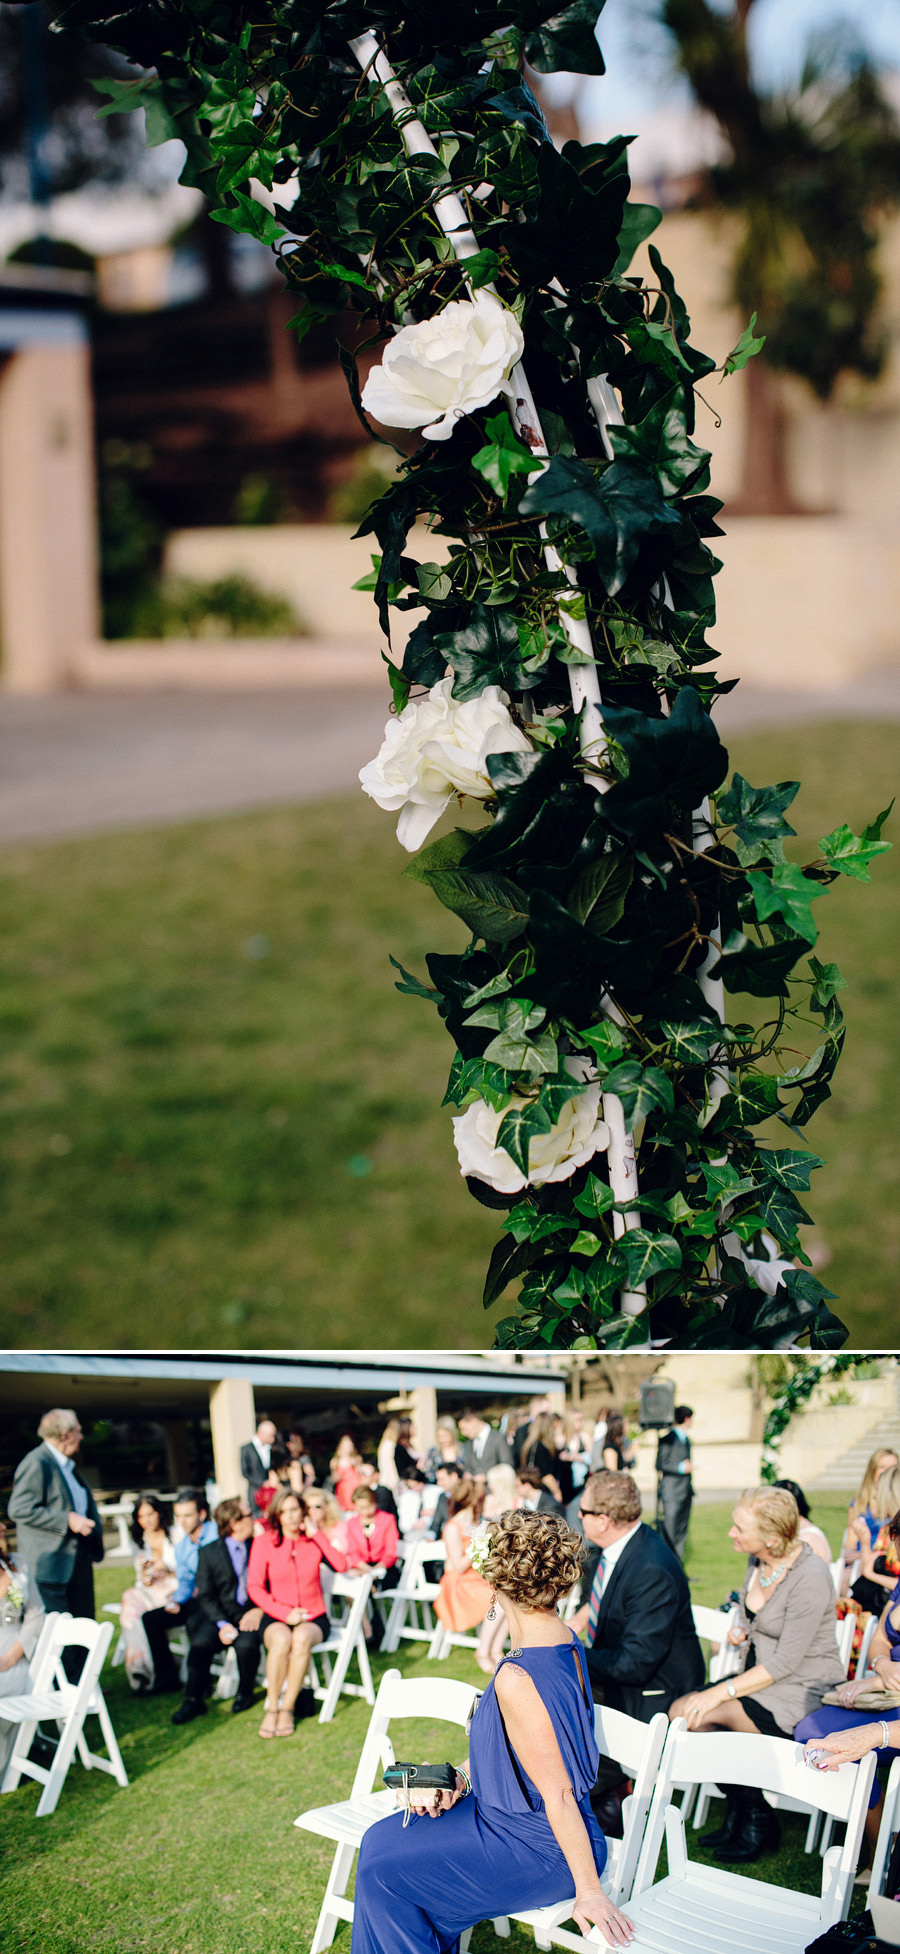 Sebel Wedding Photography: Outdoor ceremony